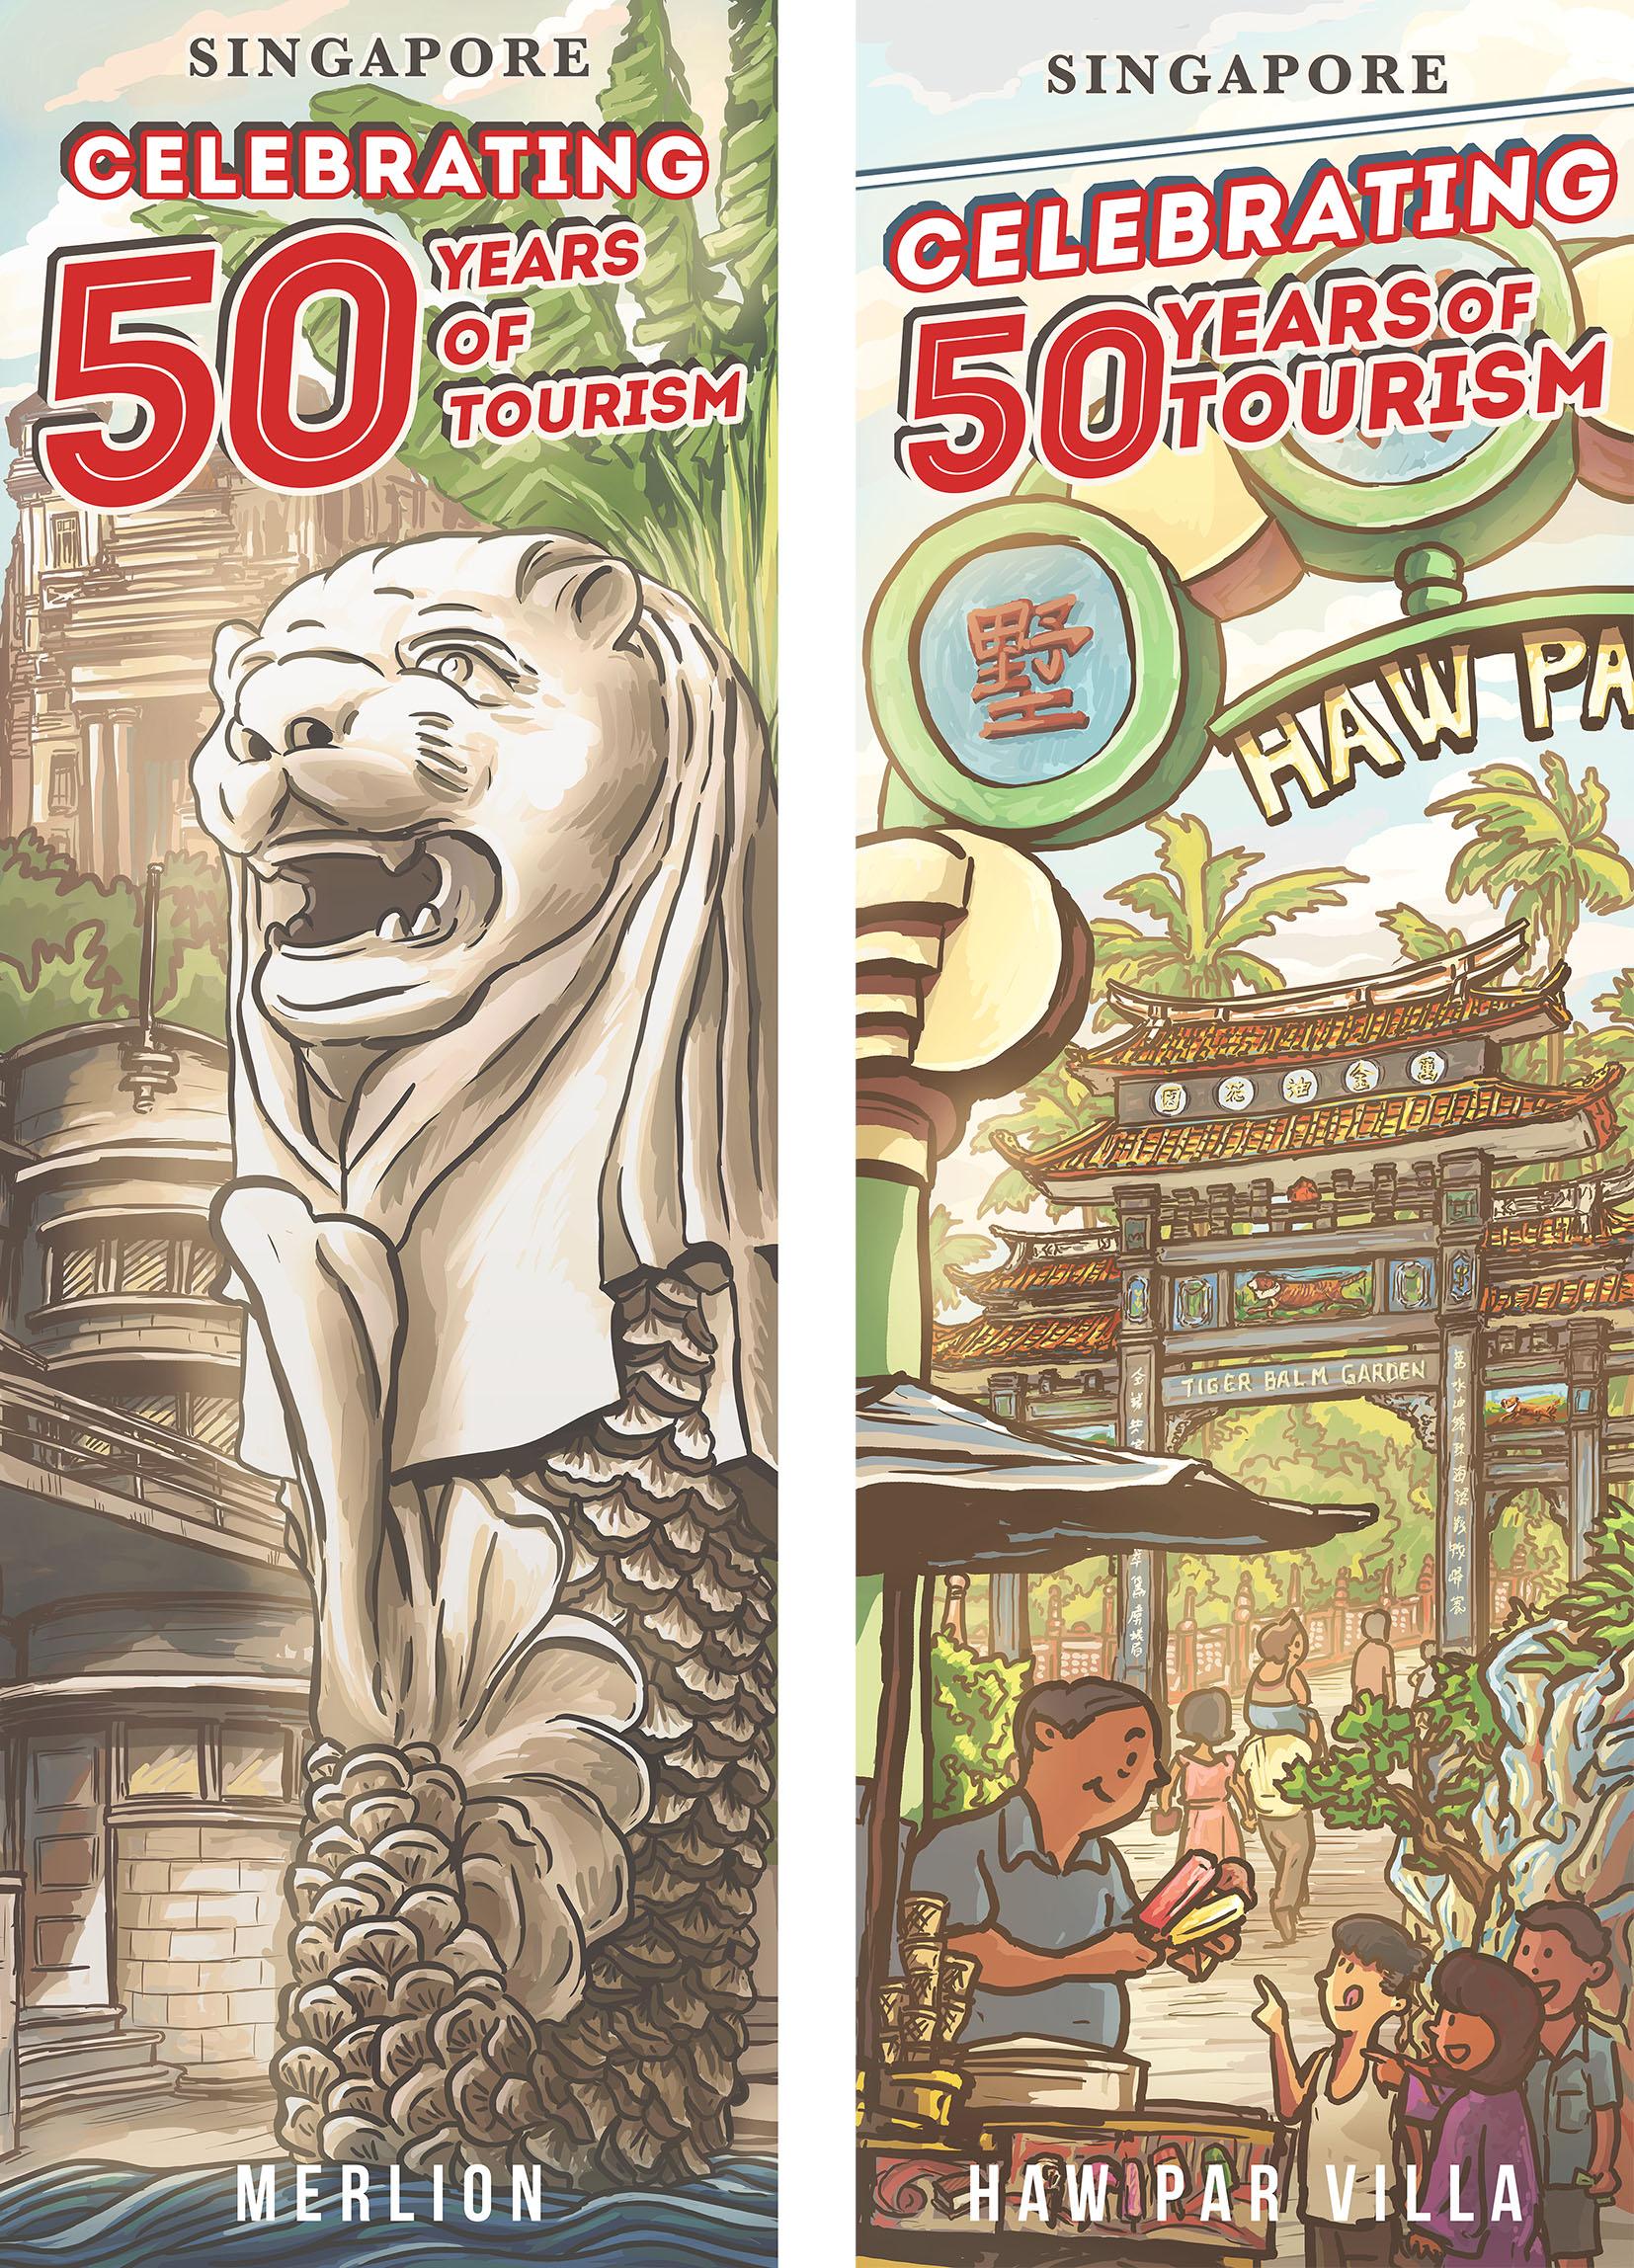 The Tourism 50 Campaign